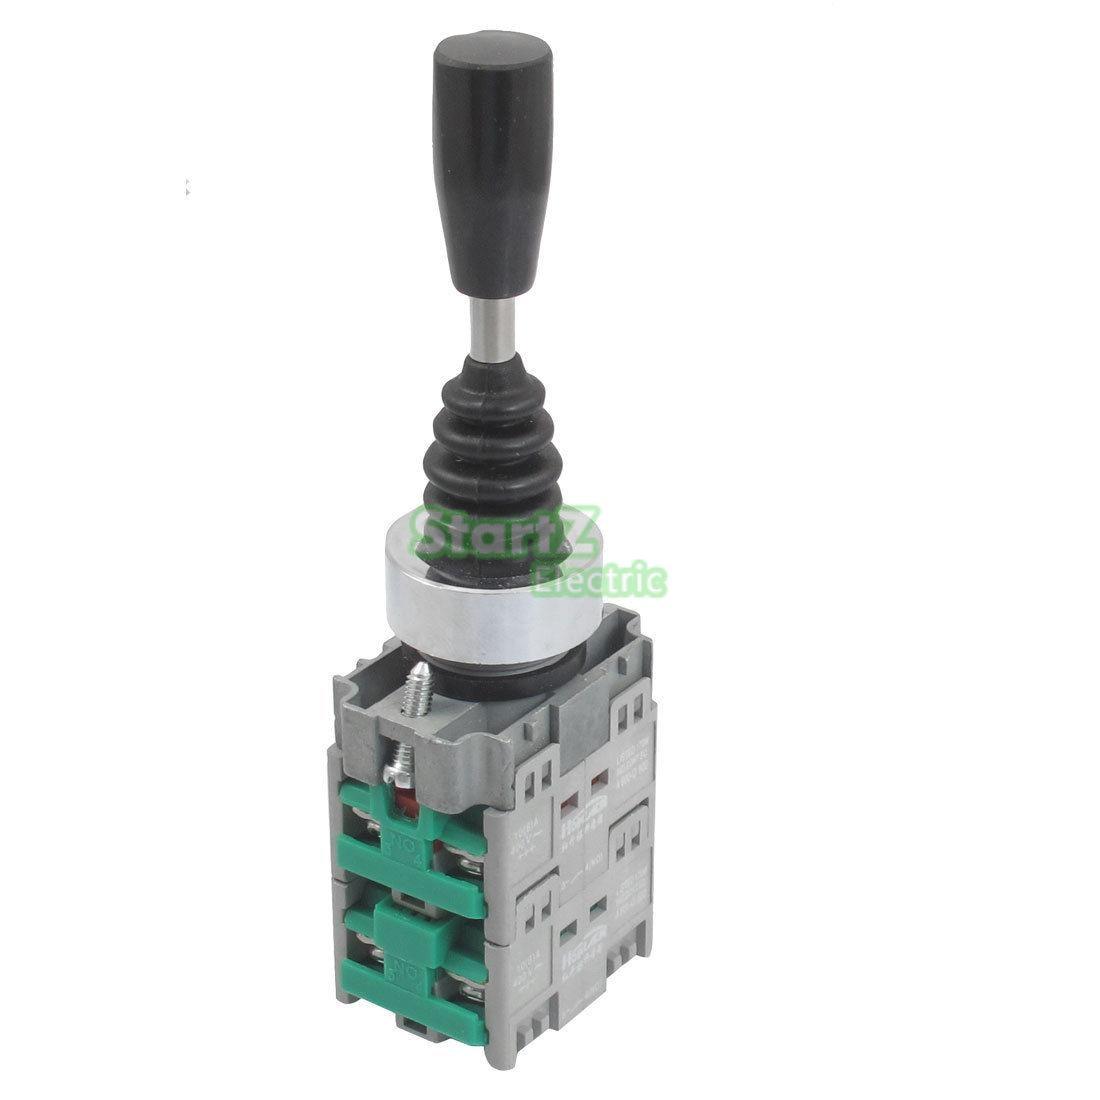 22mm 4NO 4Position Self-locking Type Monolever Joystick Switch Cross Button Switch HKL-D14 tn2ss rotary button switch gear selection type 2 22mm with self locking